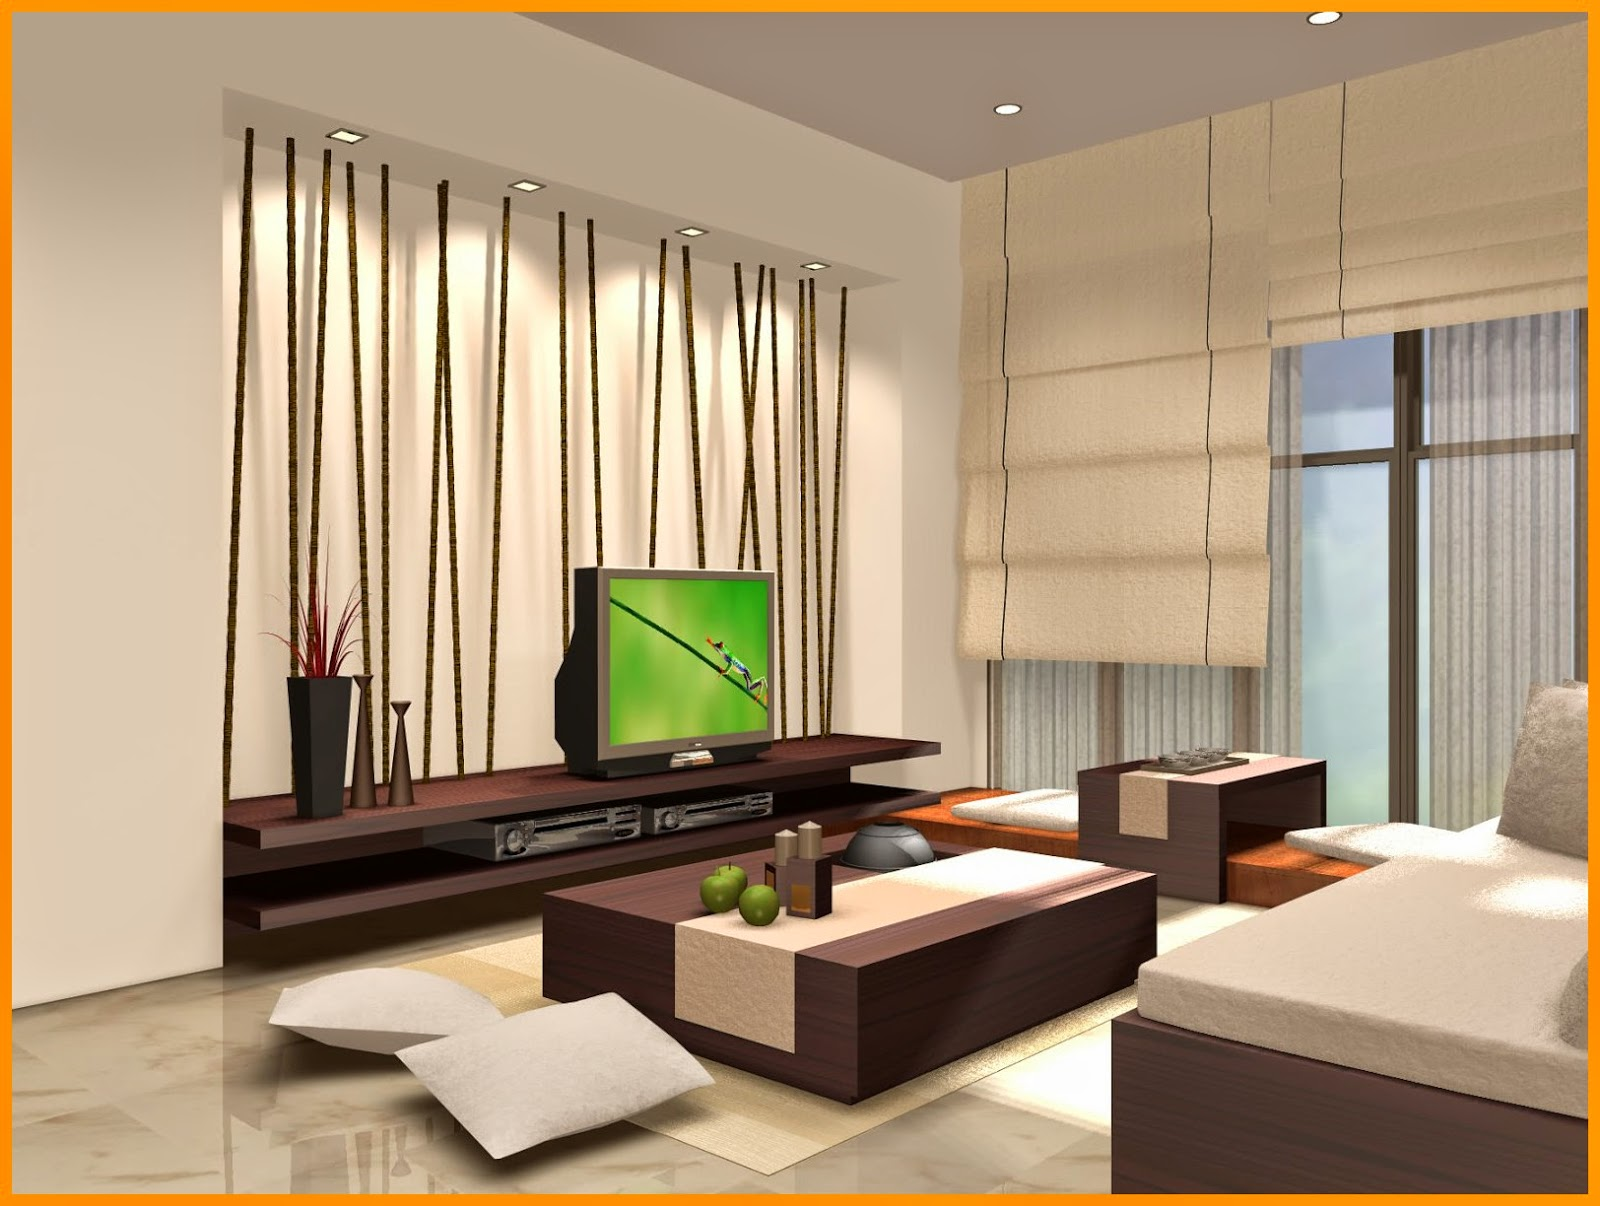 home design future: selvedgeyard the mad men of modern design